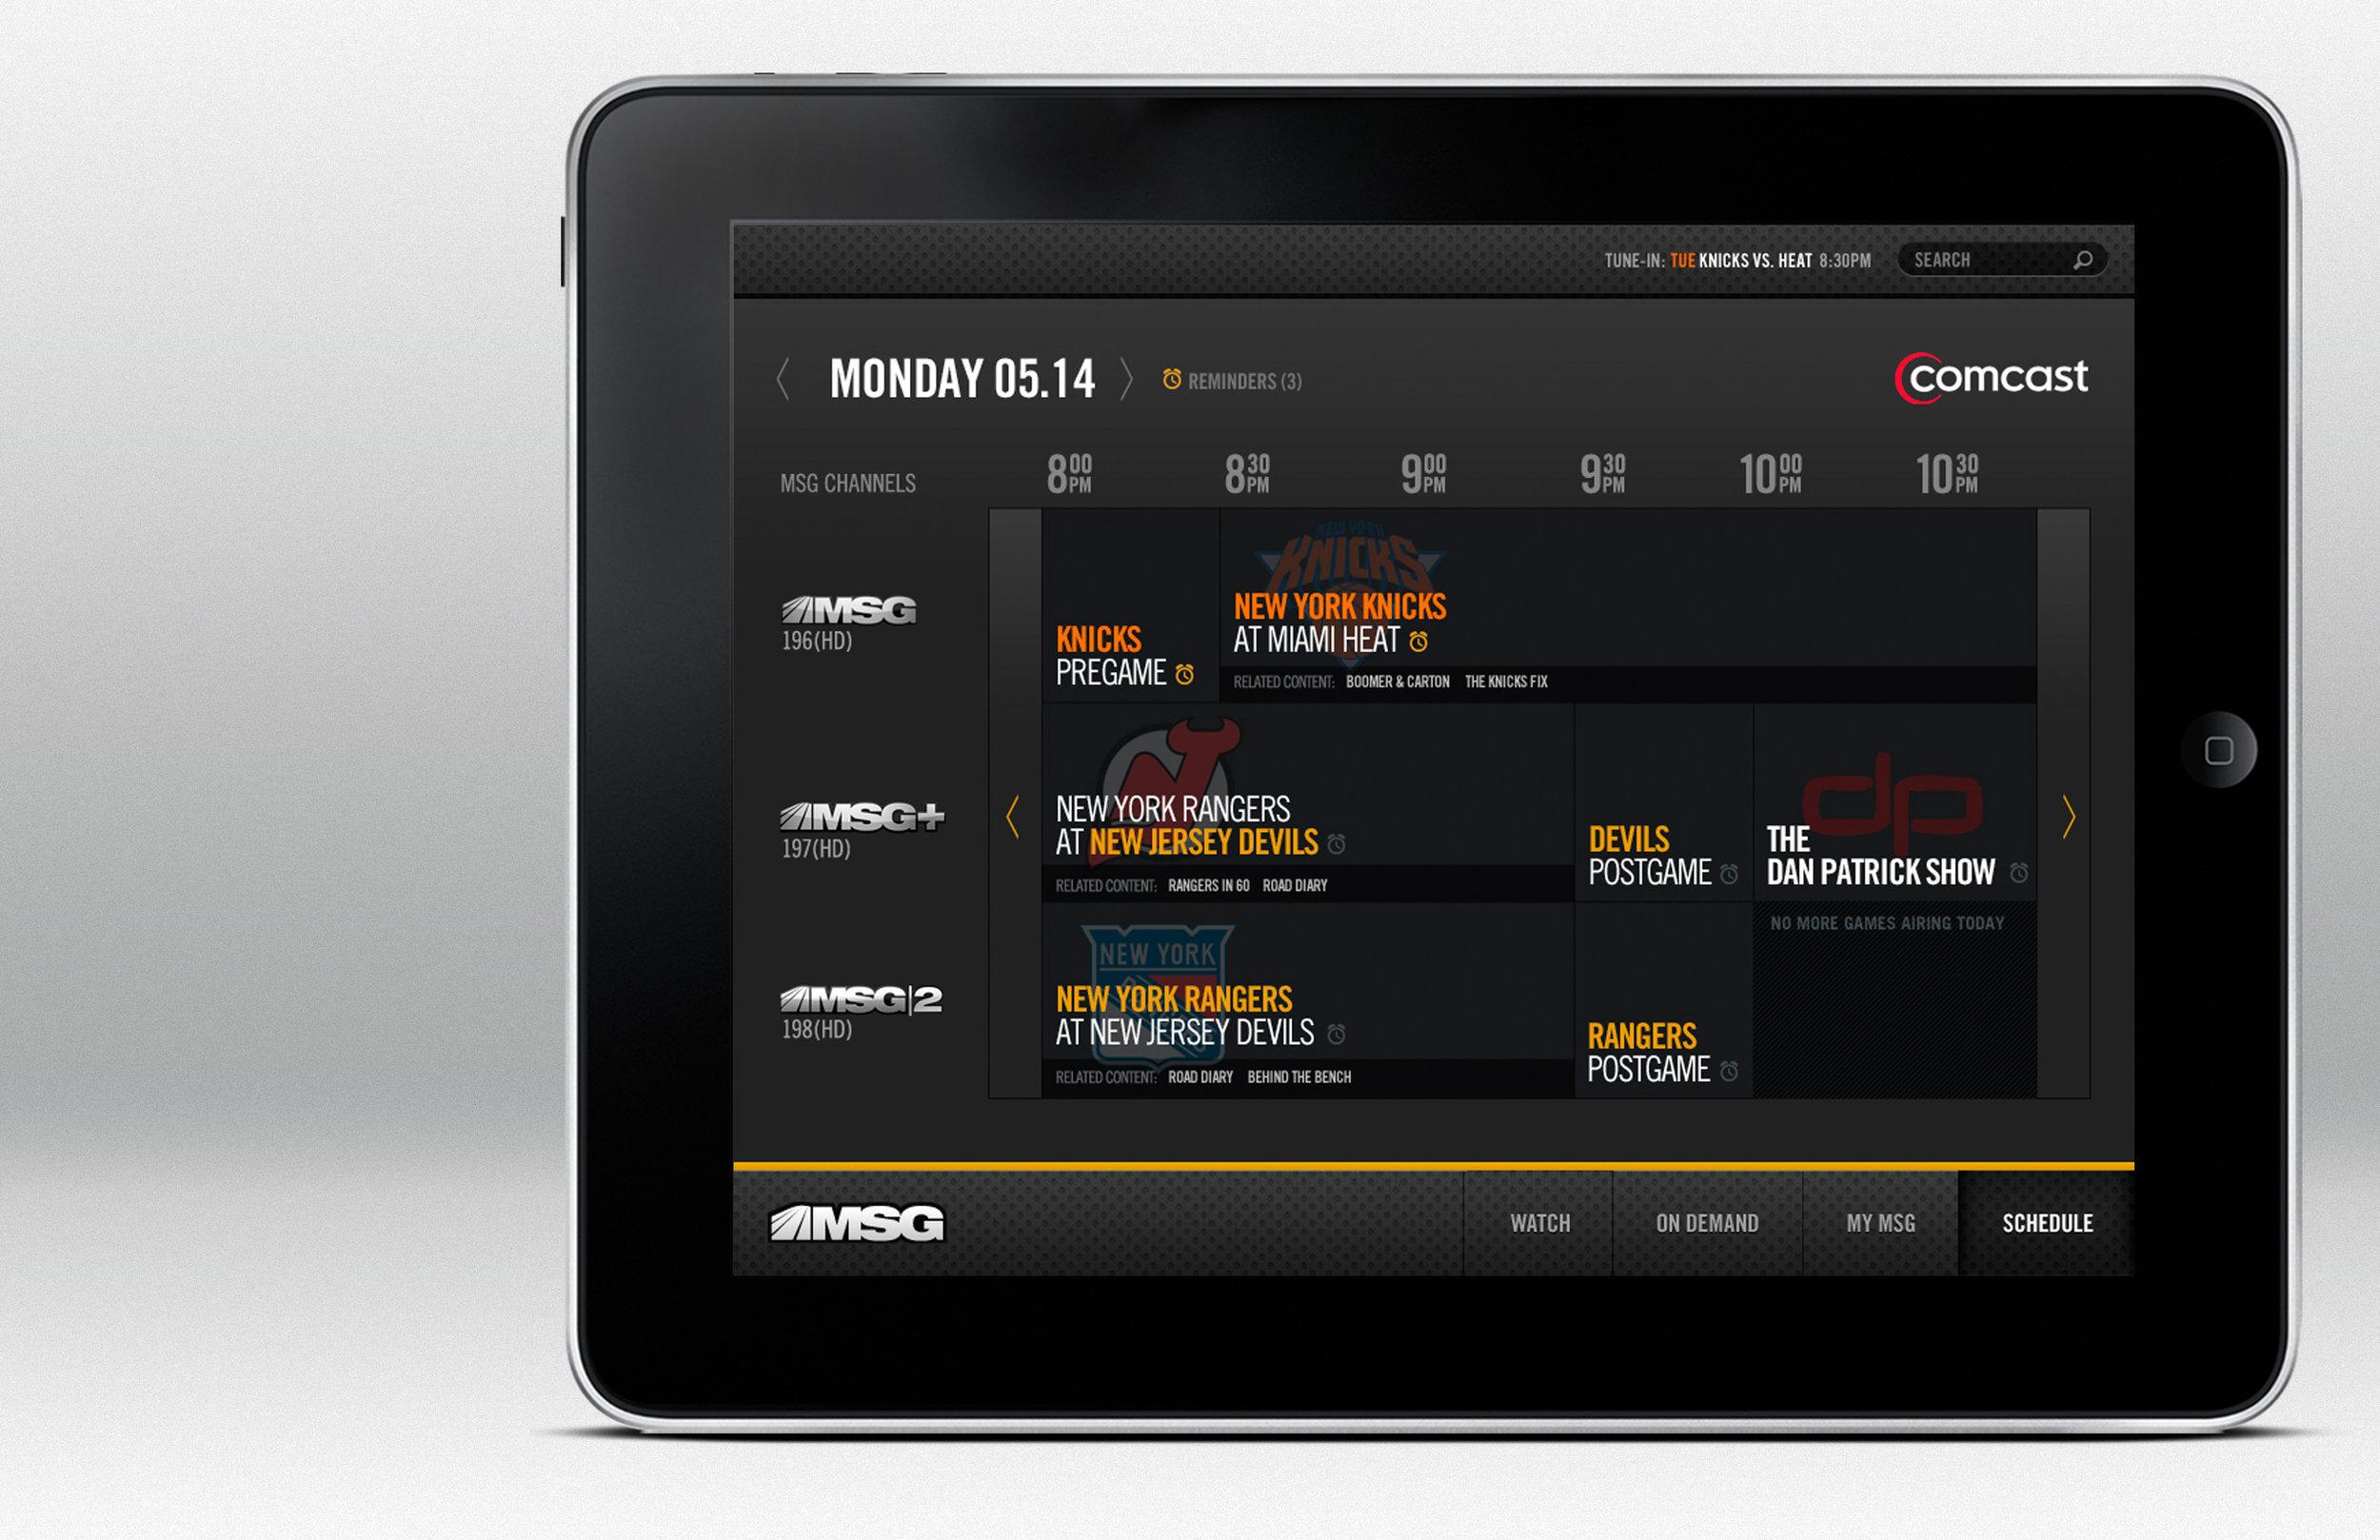 MSGGO_iPad9_schedule.jpg